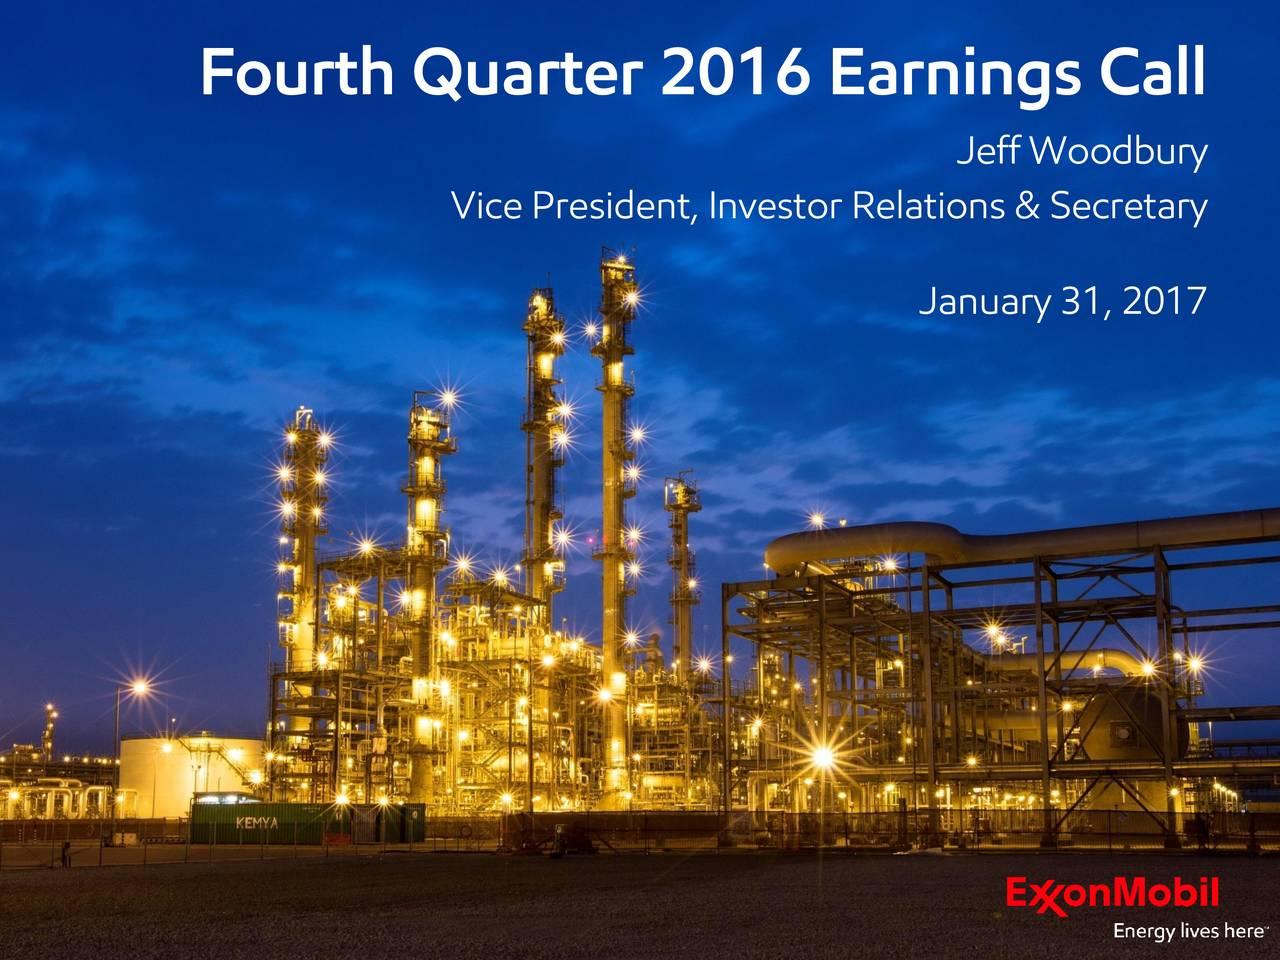 Jeff Woodbury Vice President, Investor Relations & Secretary January 31, 2017